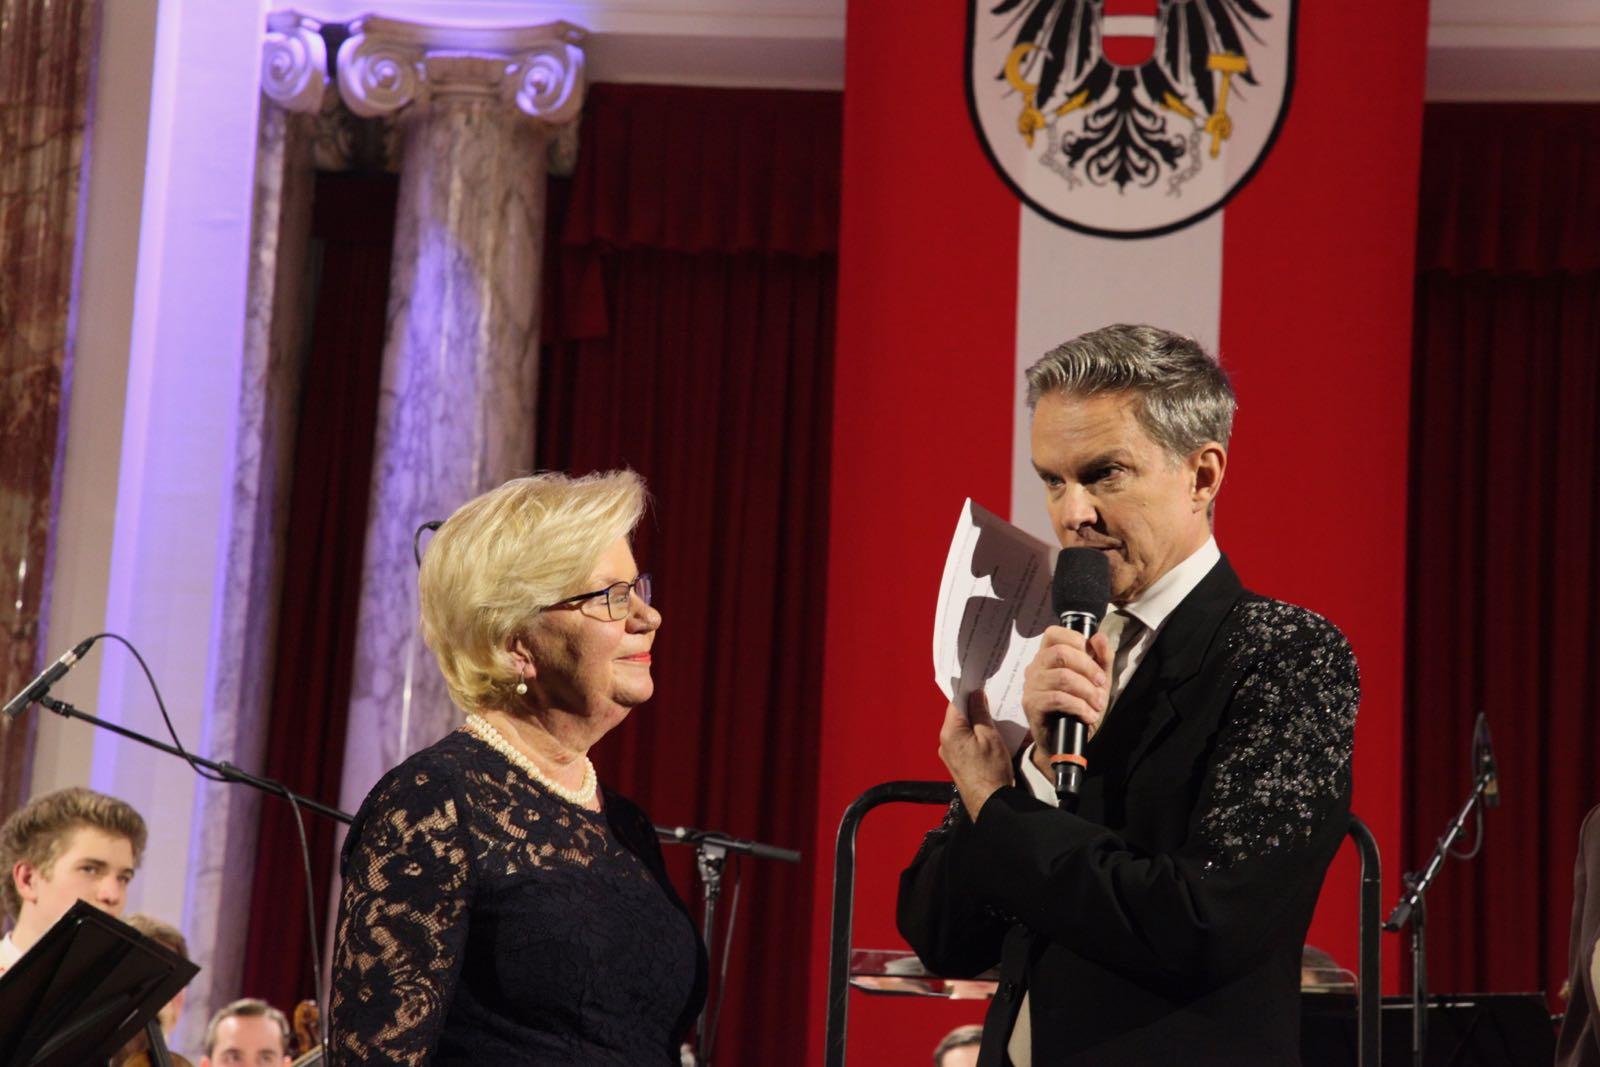 2019_03_14Gardemusik_Frühjahrskonzert_HBP_Hofburg - 72 of 177